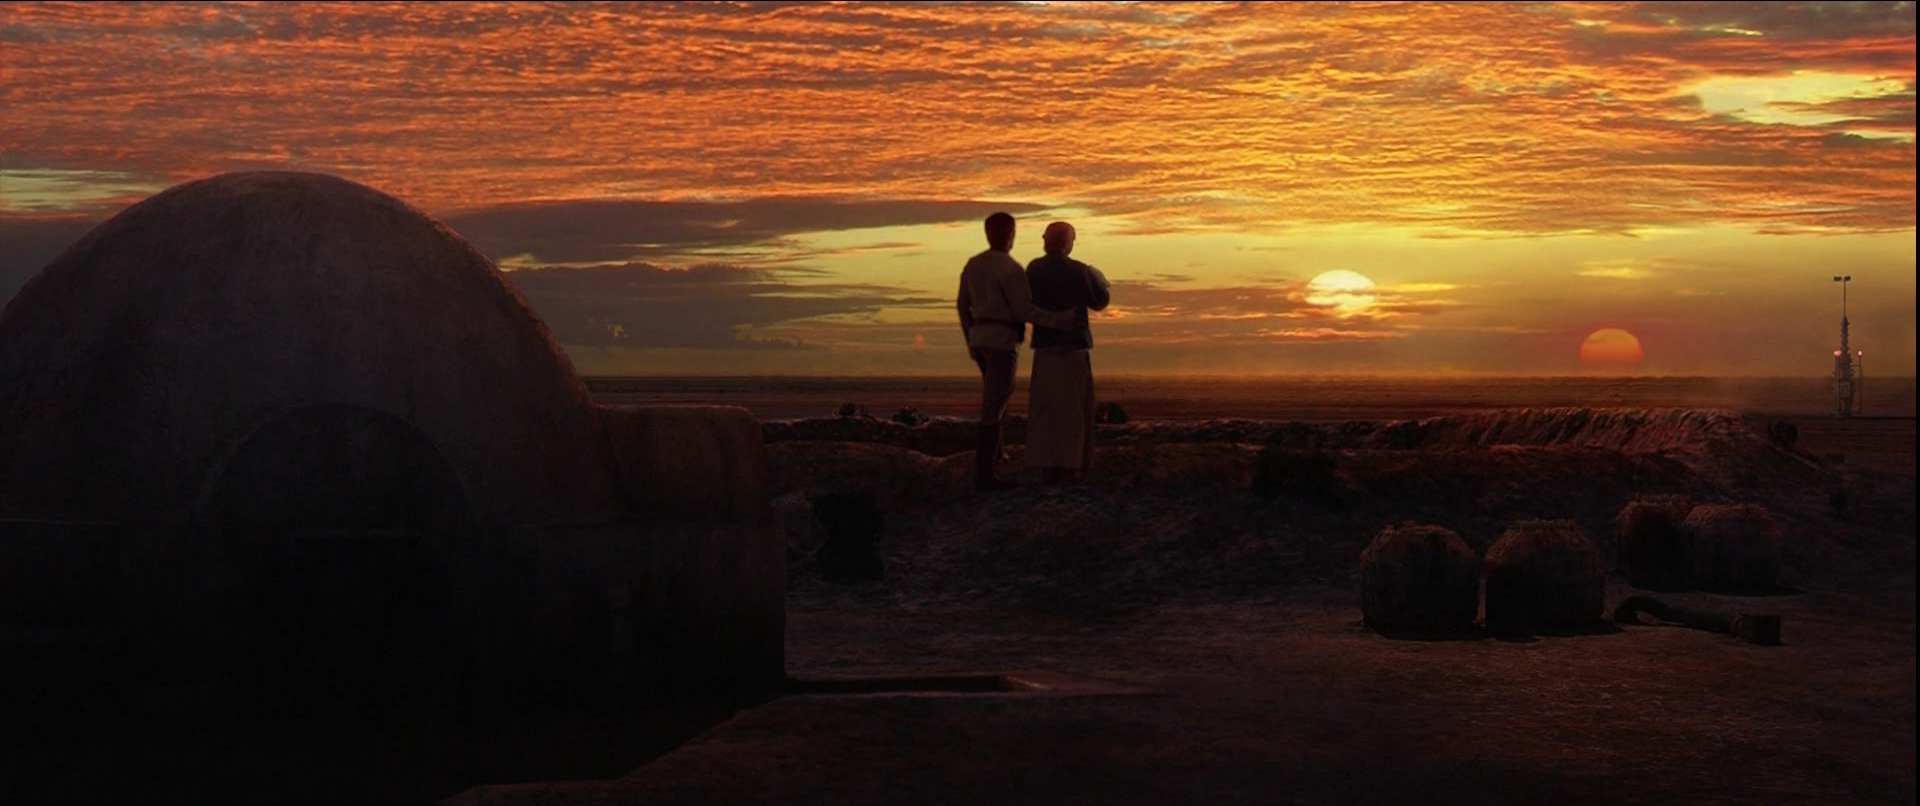 Star Wars Prequel Reboot: Blog #4 – The Skywalker Family Secrets